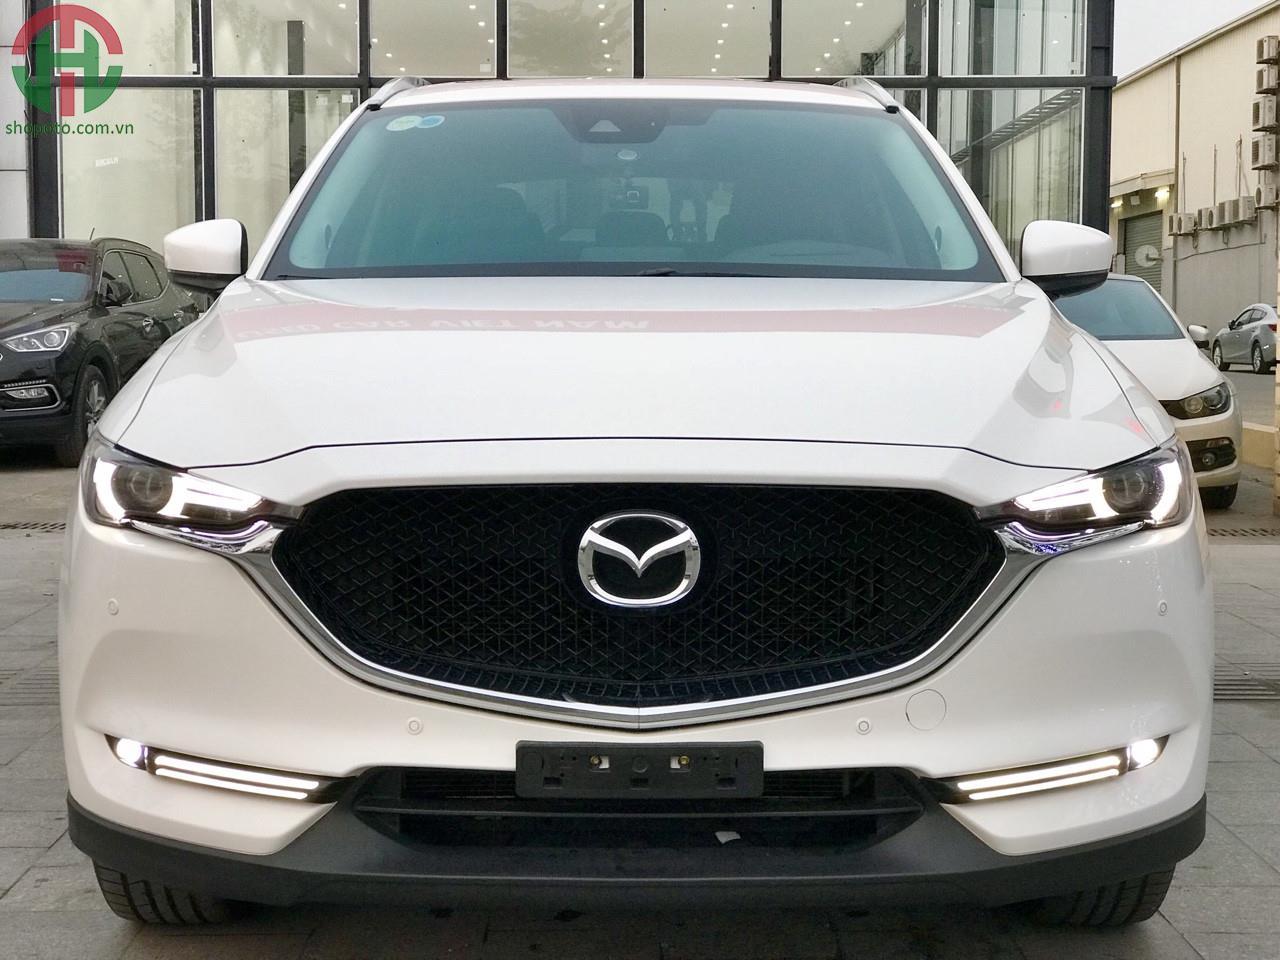 Mazda CX5 2.5 AT 2WD 2018 màu Trắng